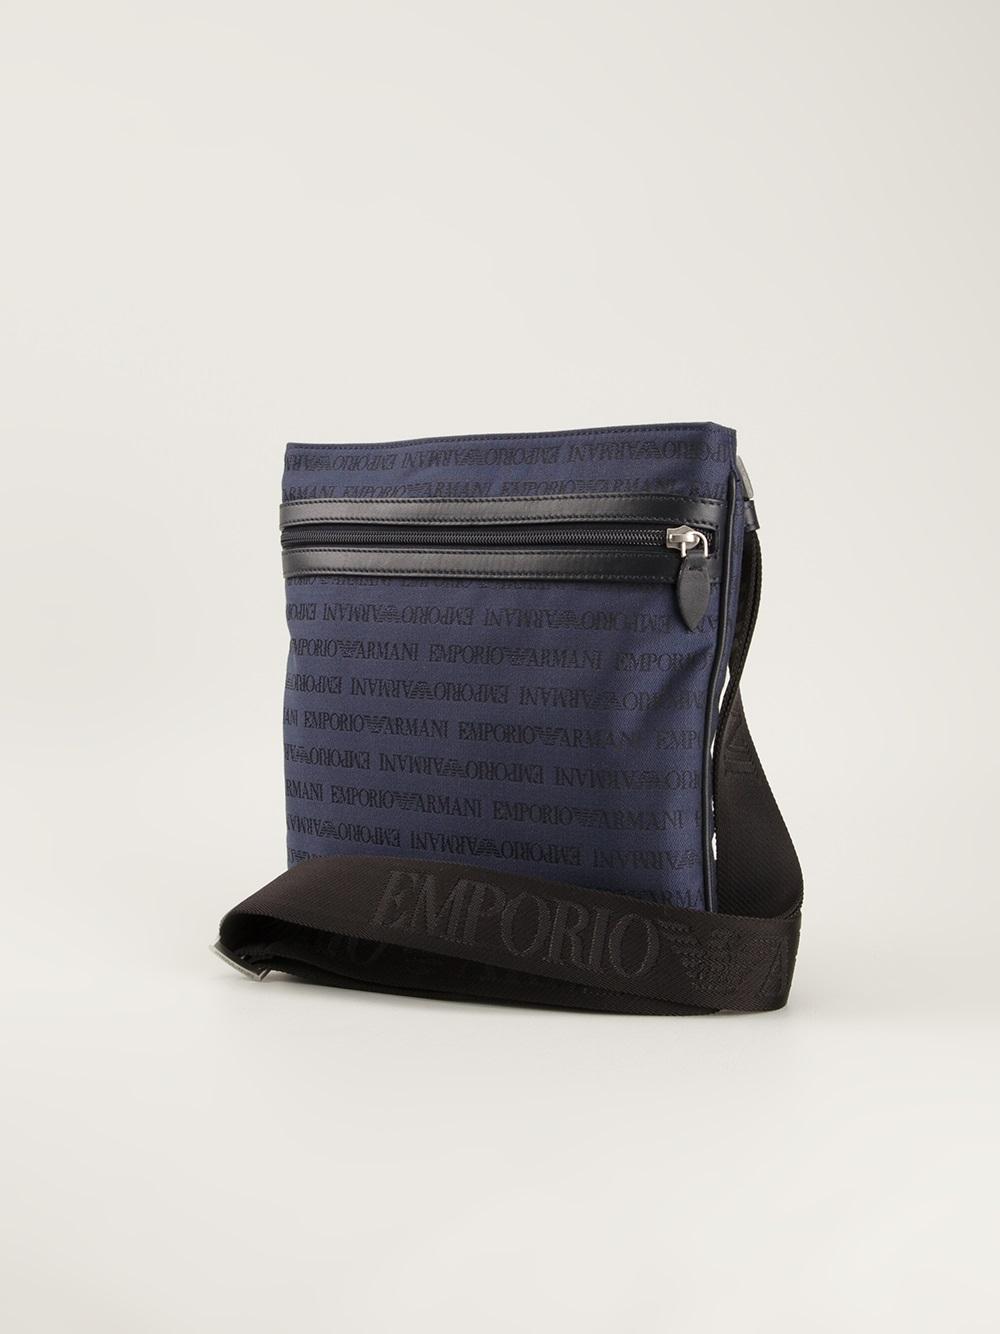 Lyst - Emporio Armani Logo Messenger Bag in Blue for Men 5fcaeb6e94e0a